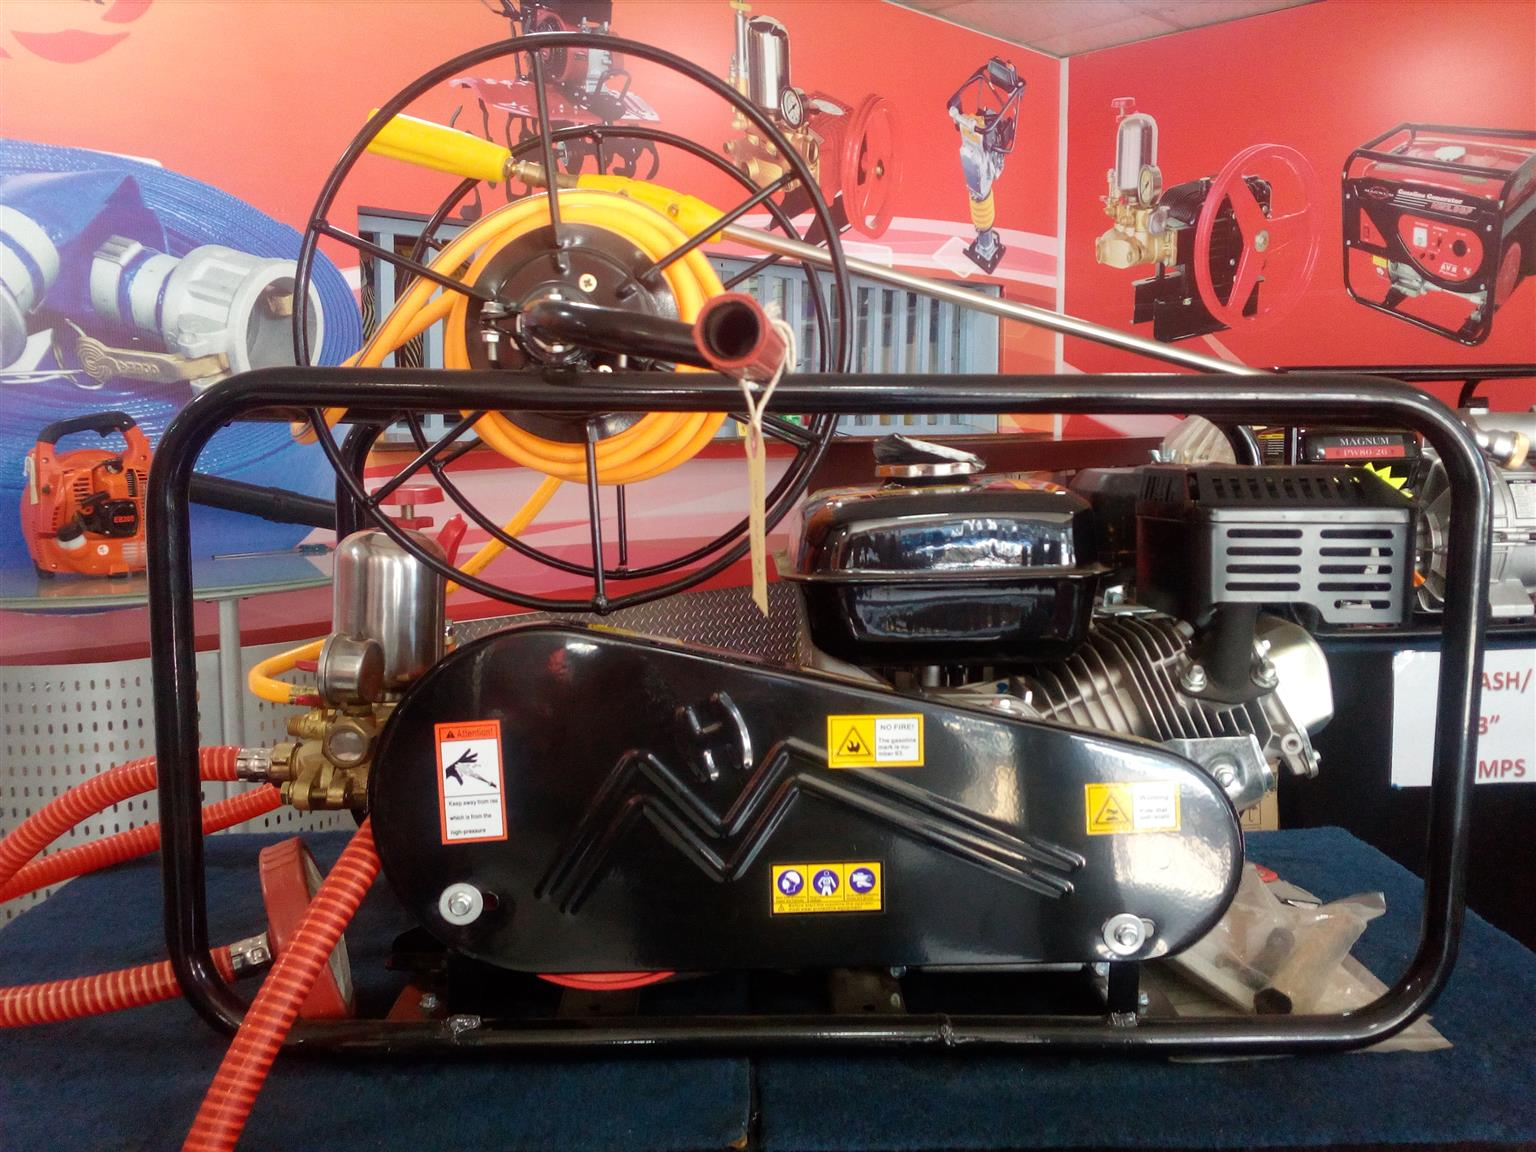 Magnum Power sprayer petrol price incl vat